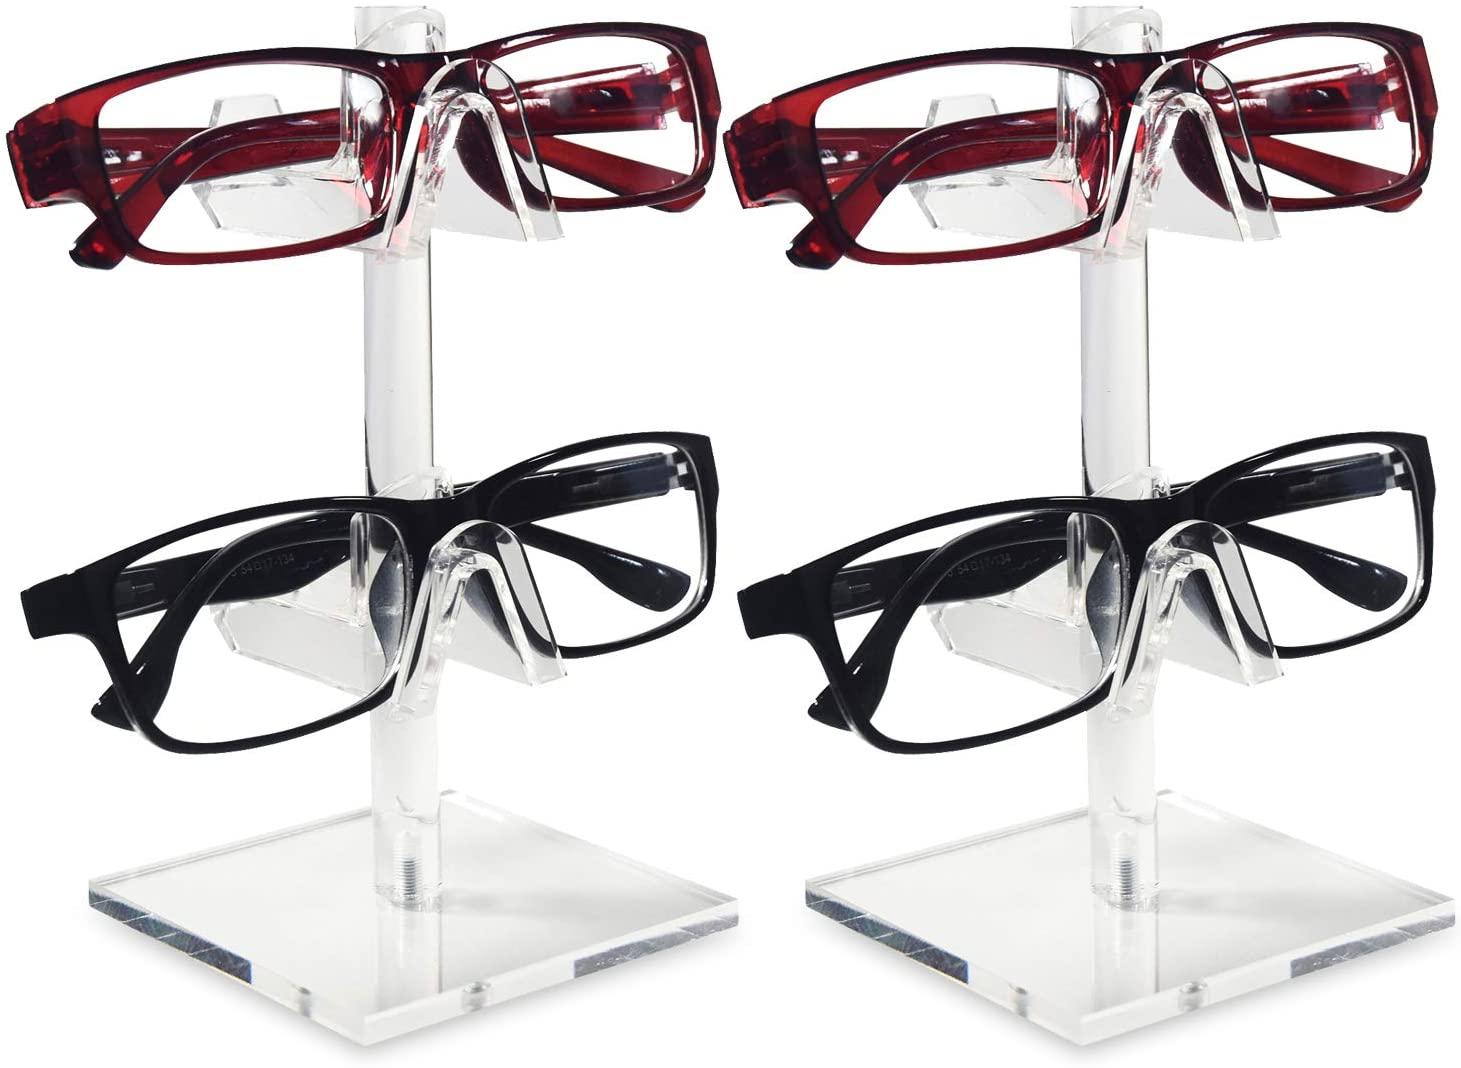 Mooca 2 Piece Set Acrylic Eyeglasses Frame Riser Display Stand Sunglasses Rack Sunglasses Rack Holder Acrylic Eyewear Display (2 Frames for Each Holder)